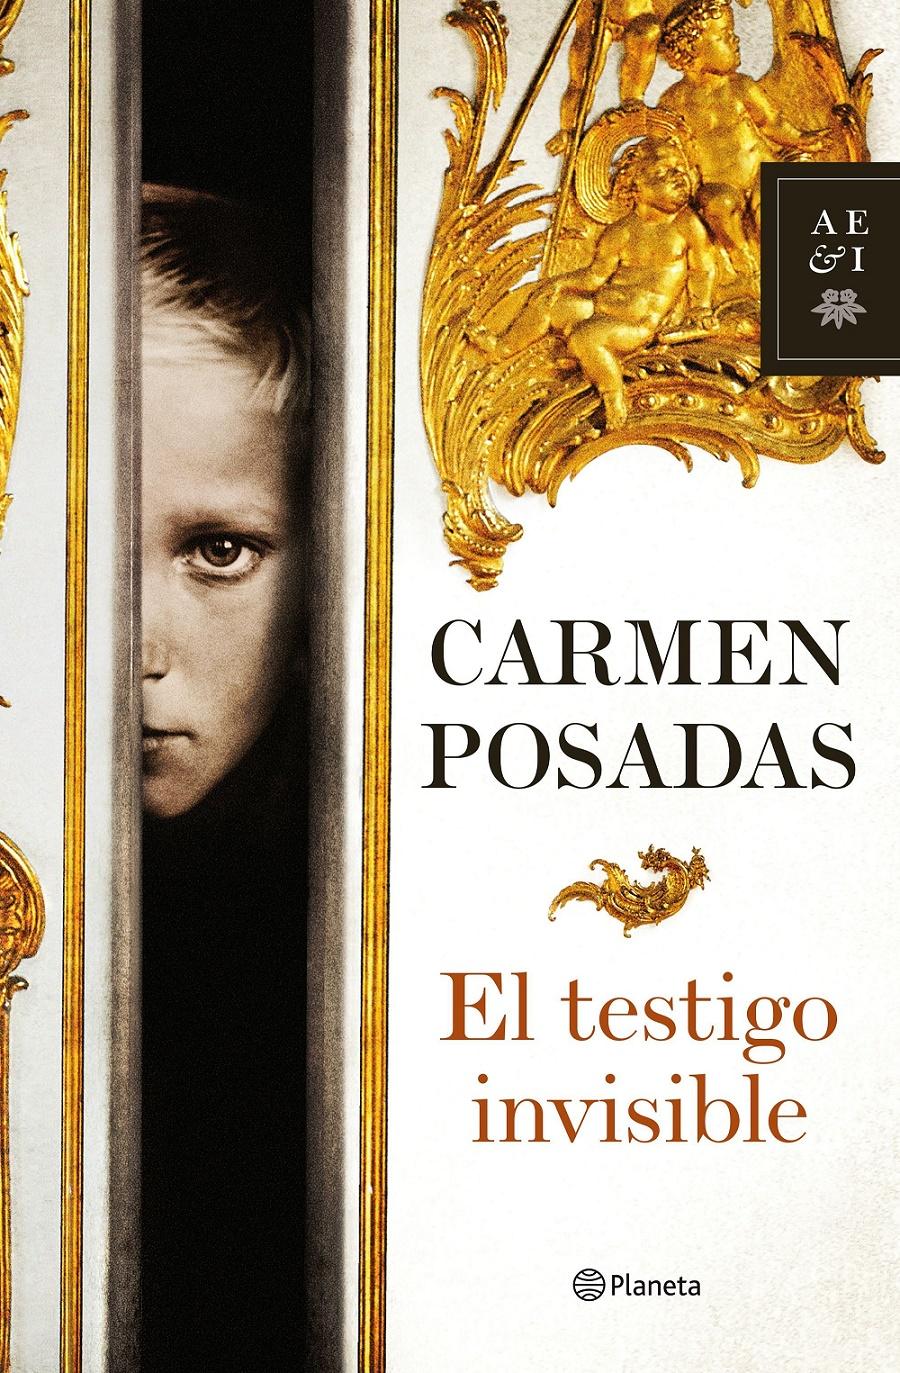 https://laantiguabiblos.blogspot.com.es/2017/10/el-testigo-invisible-carmen-posadas.html